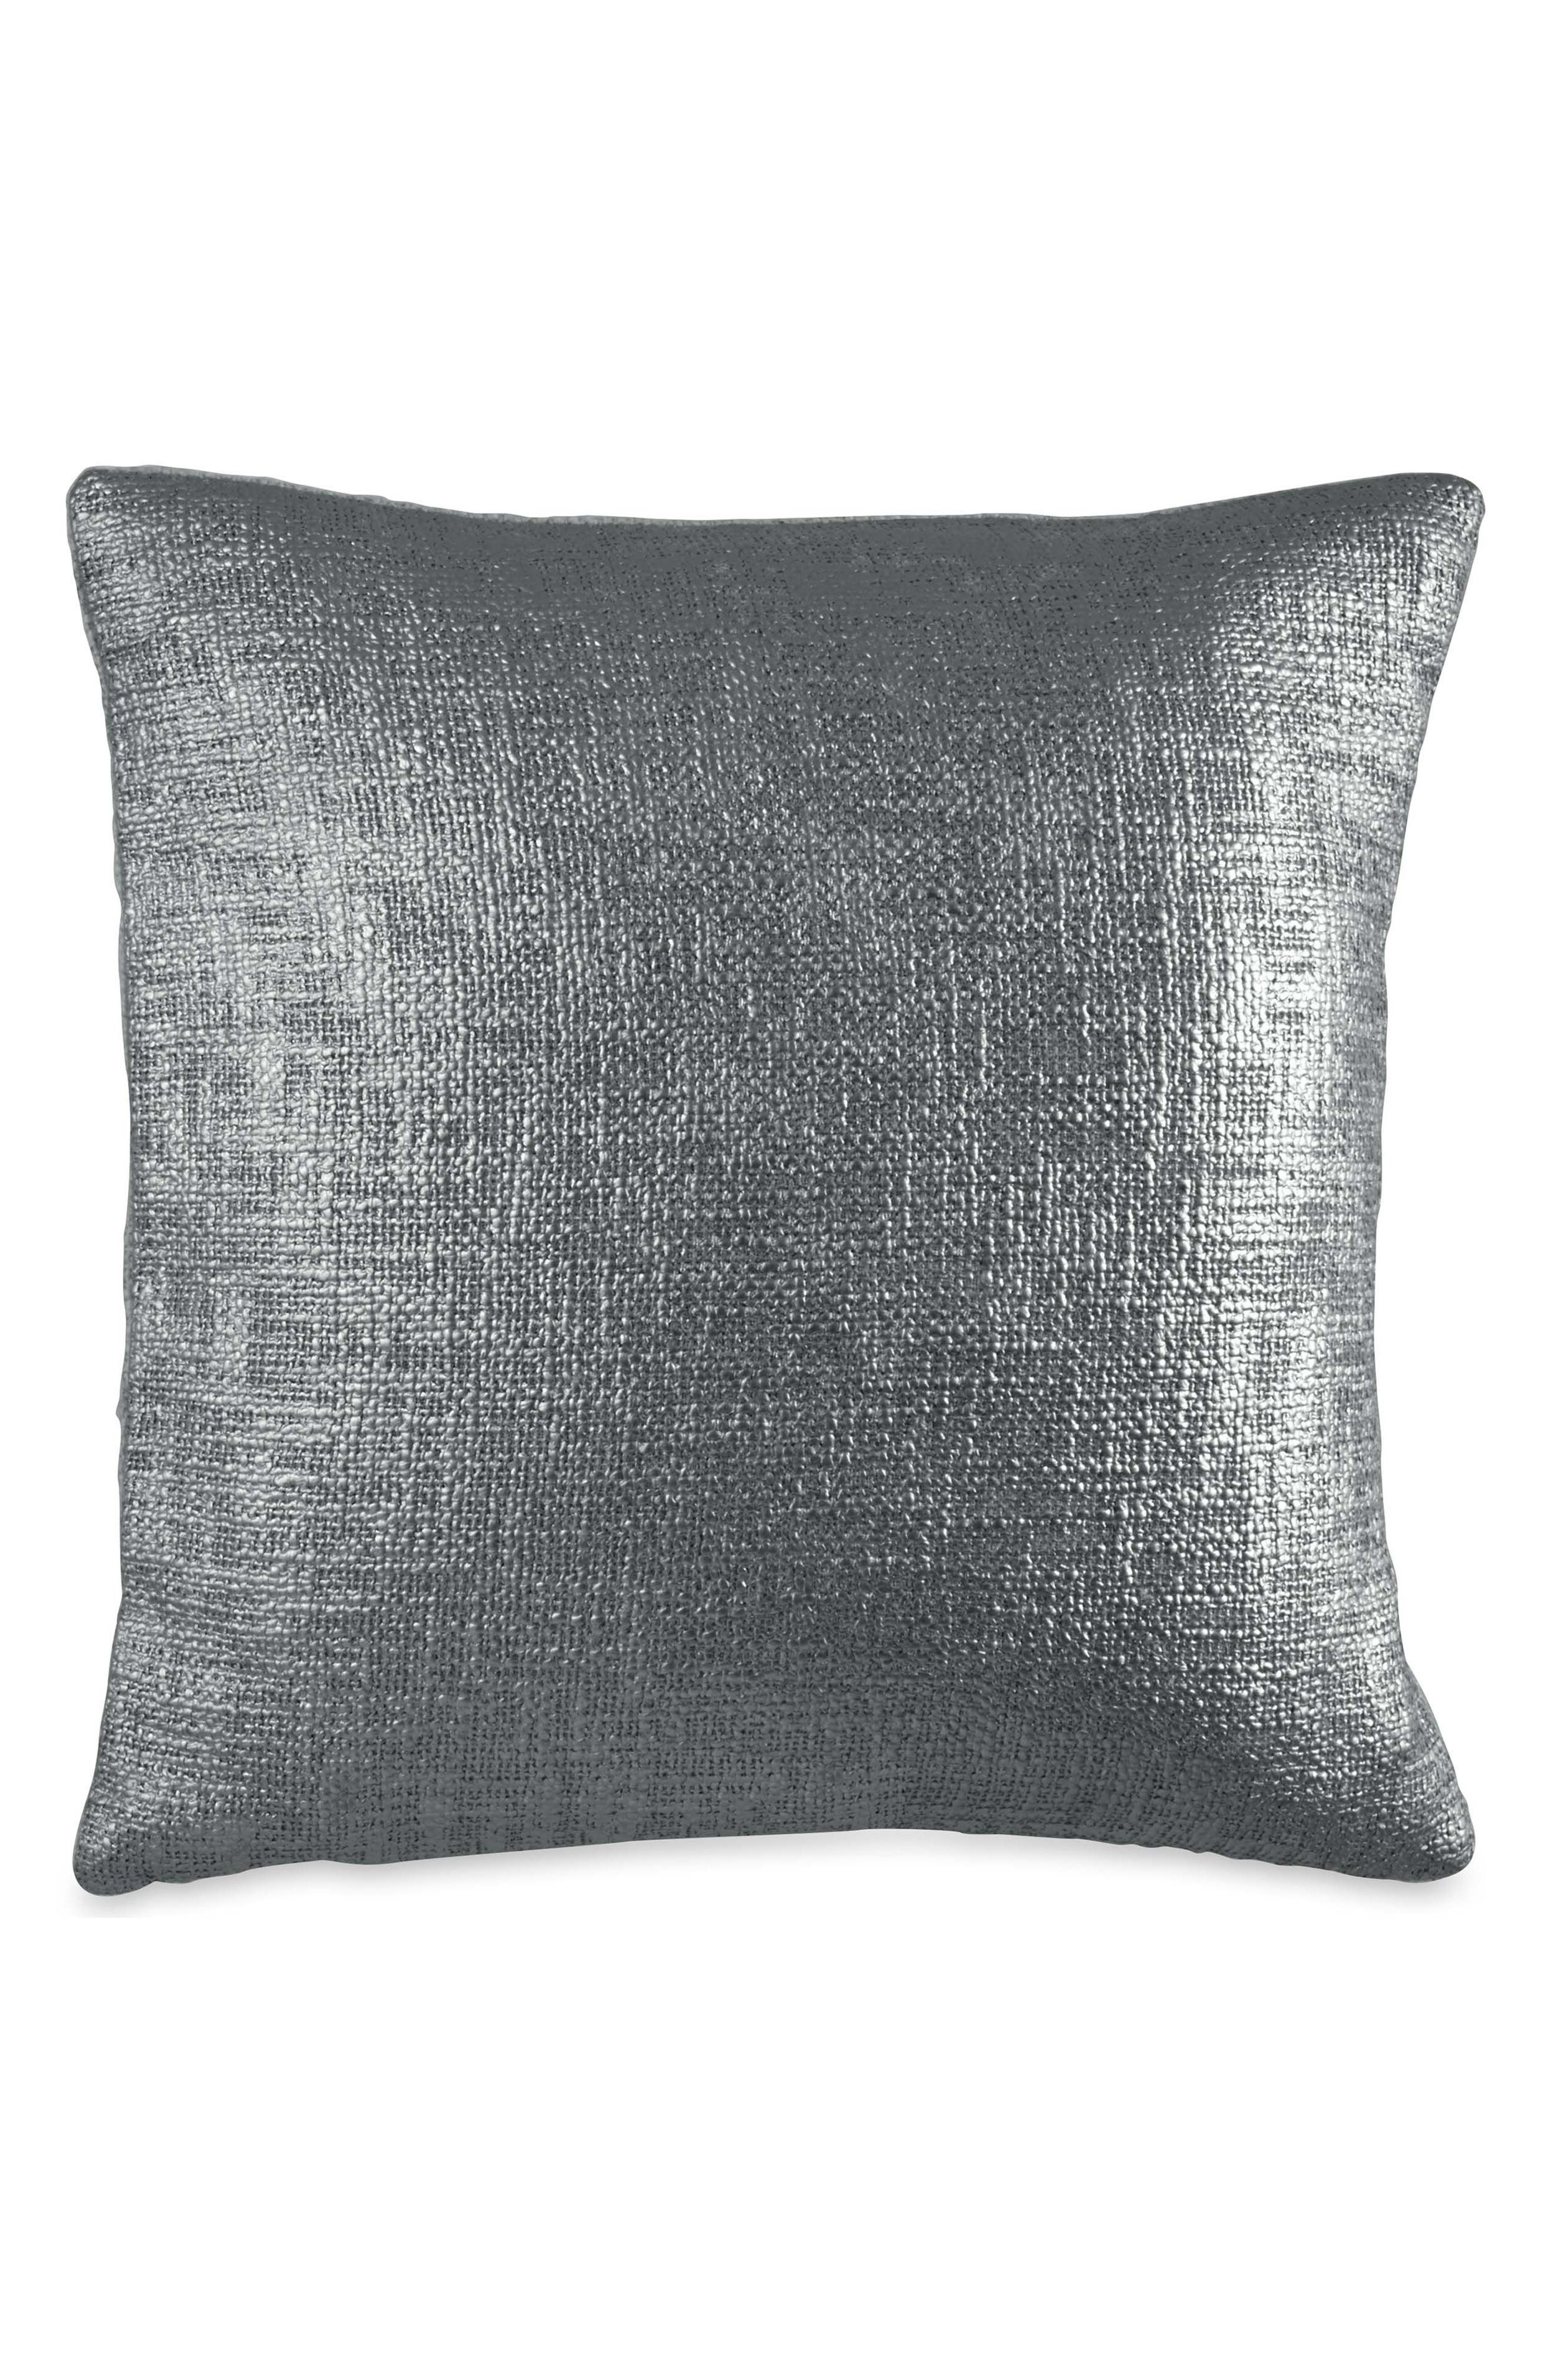 Alternate Image 1 Selected - DKNY Metro Matelassé Accent Pillow